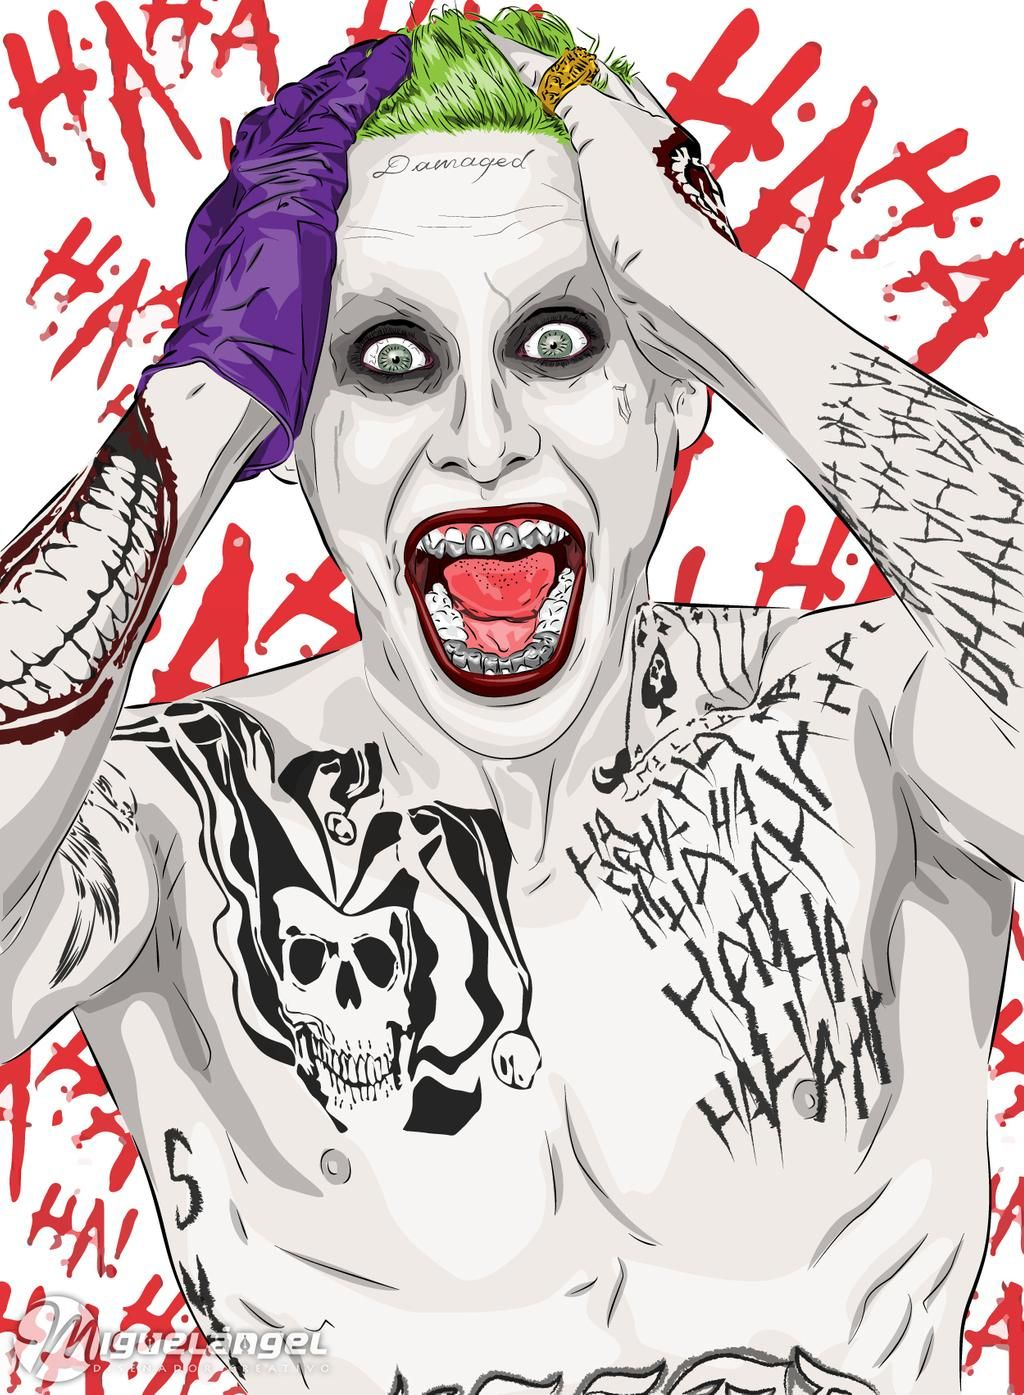 The Joker By Mac Ve On Deviantart Joker Artwork Joker Art Joker Drawings Graffiti joker joker haha wallpaper